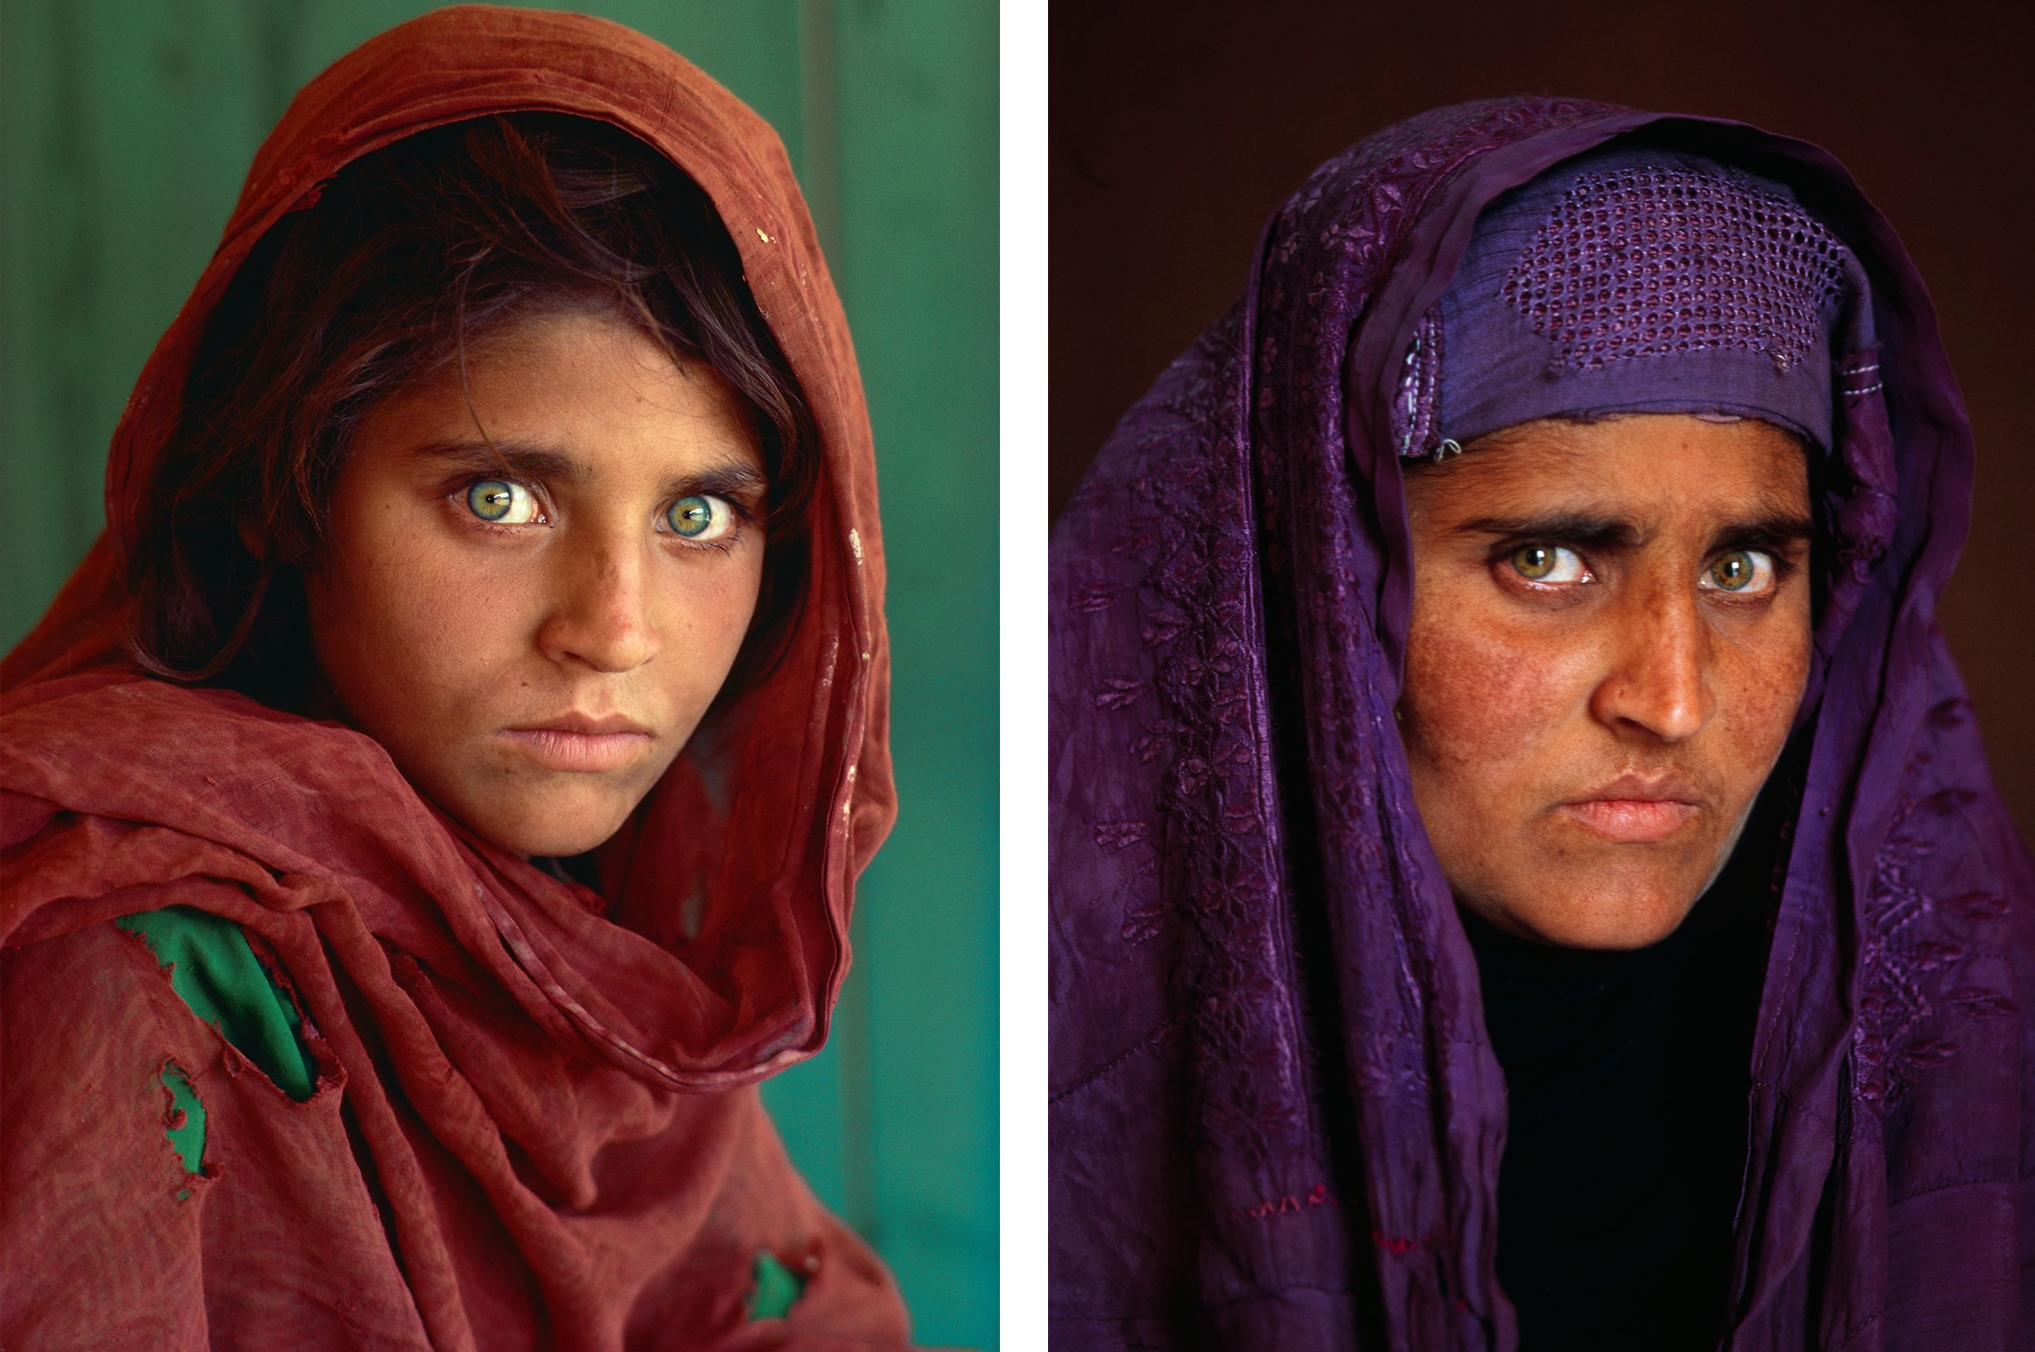 Sharbat Gula, the Afghan Girl, left, 1984 at Nasir Bagh refugee camp near Peshawar, Pakistan_right 2002